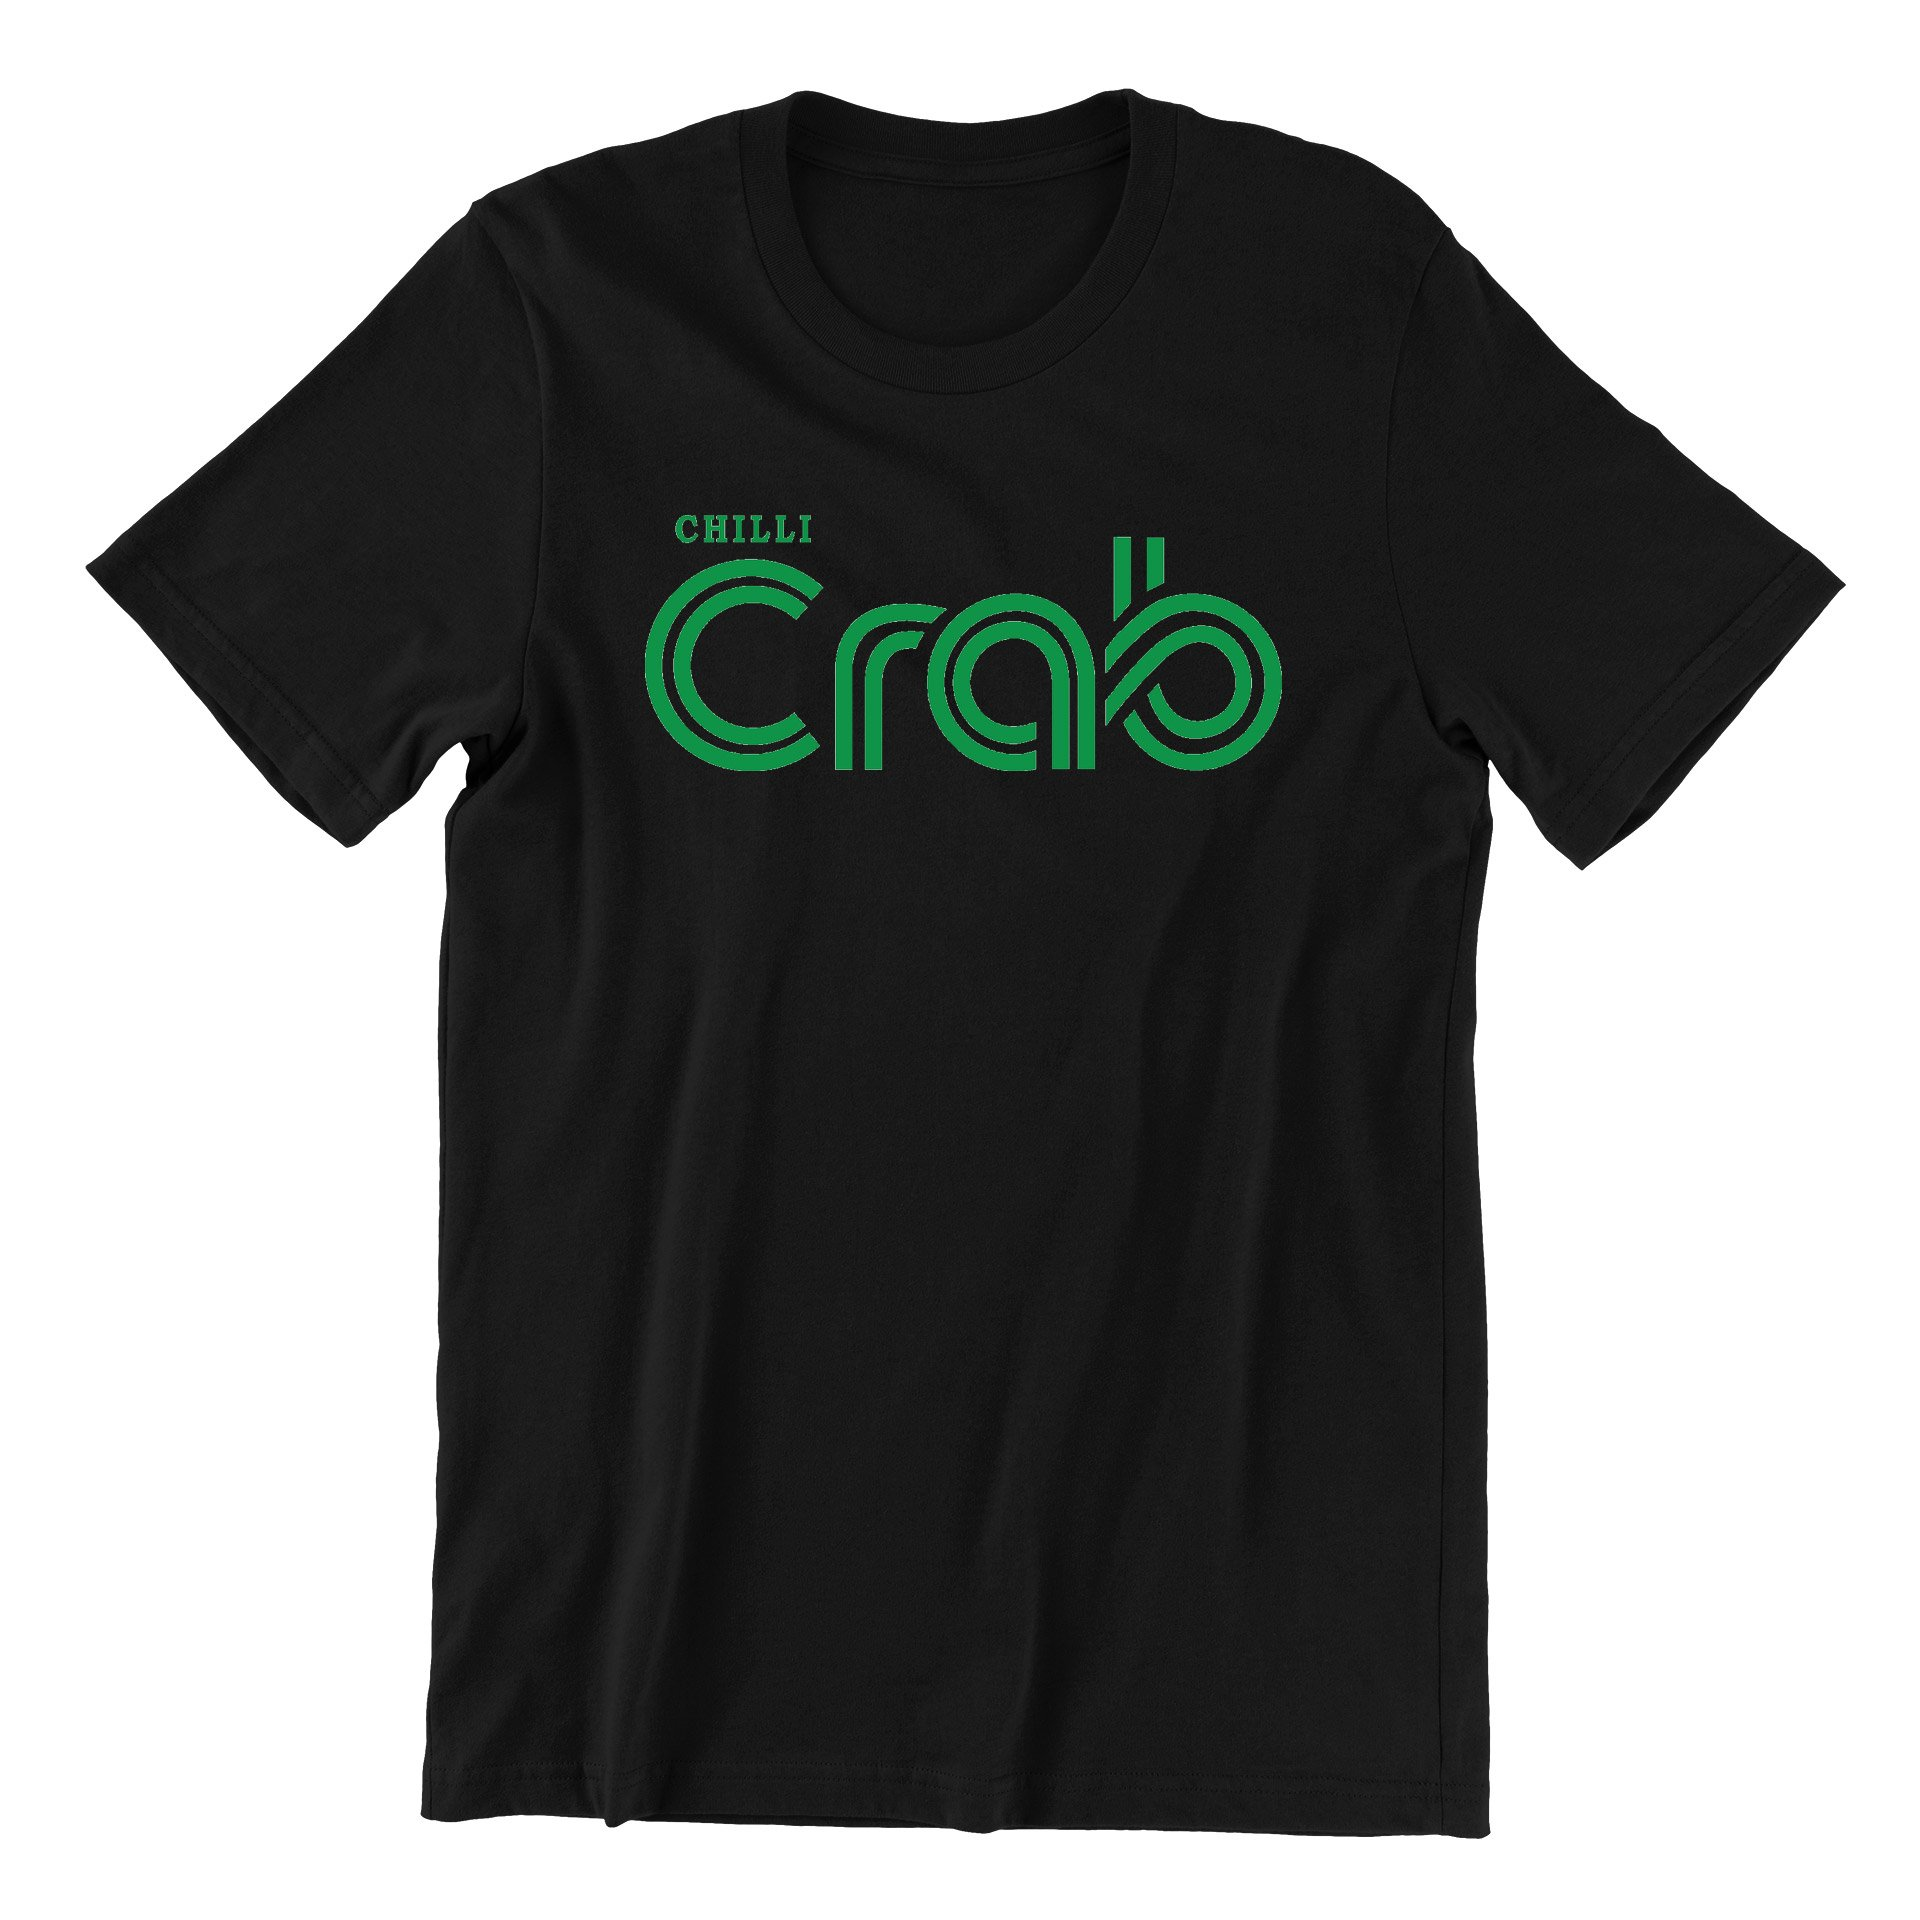 Chilli Crab Crew Neck S-Sleeve T-shirt